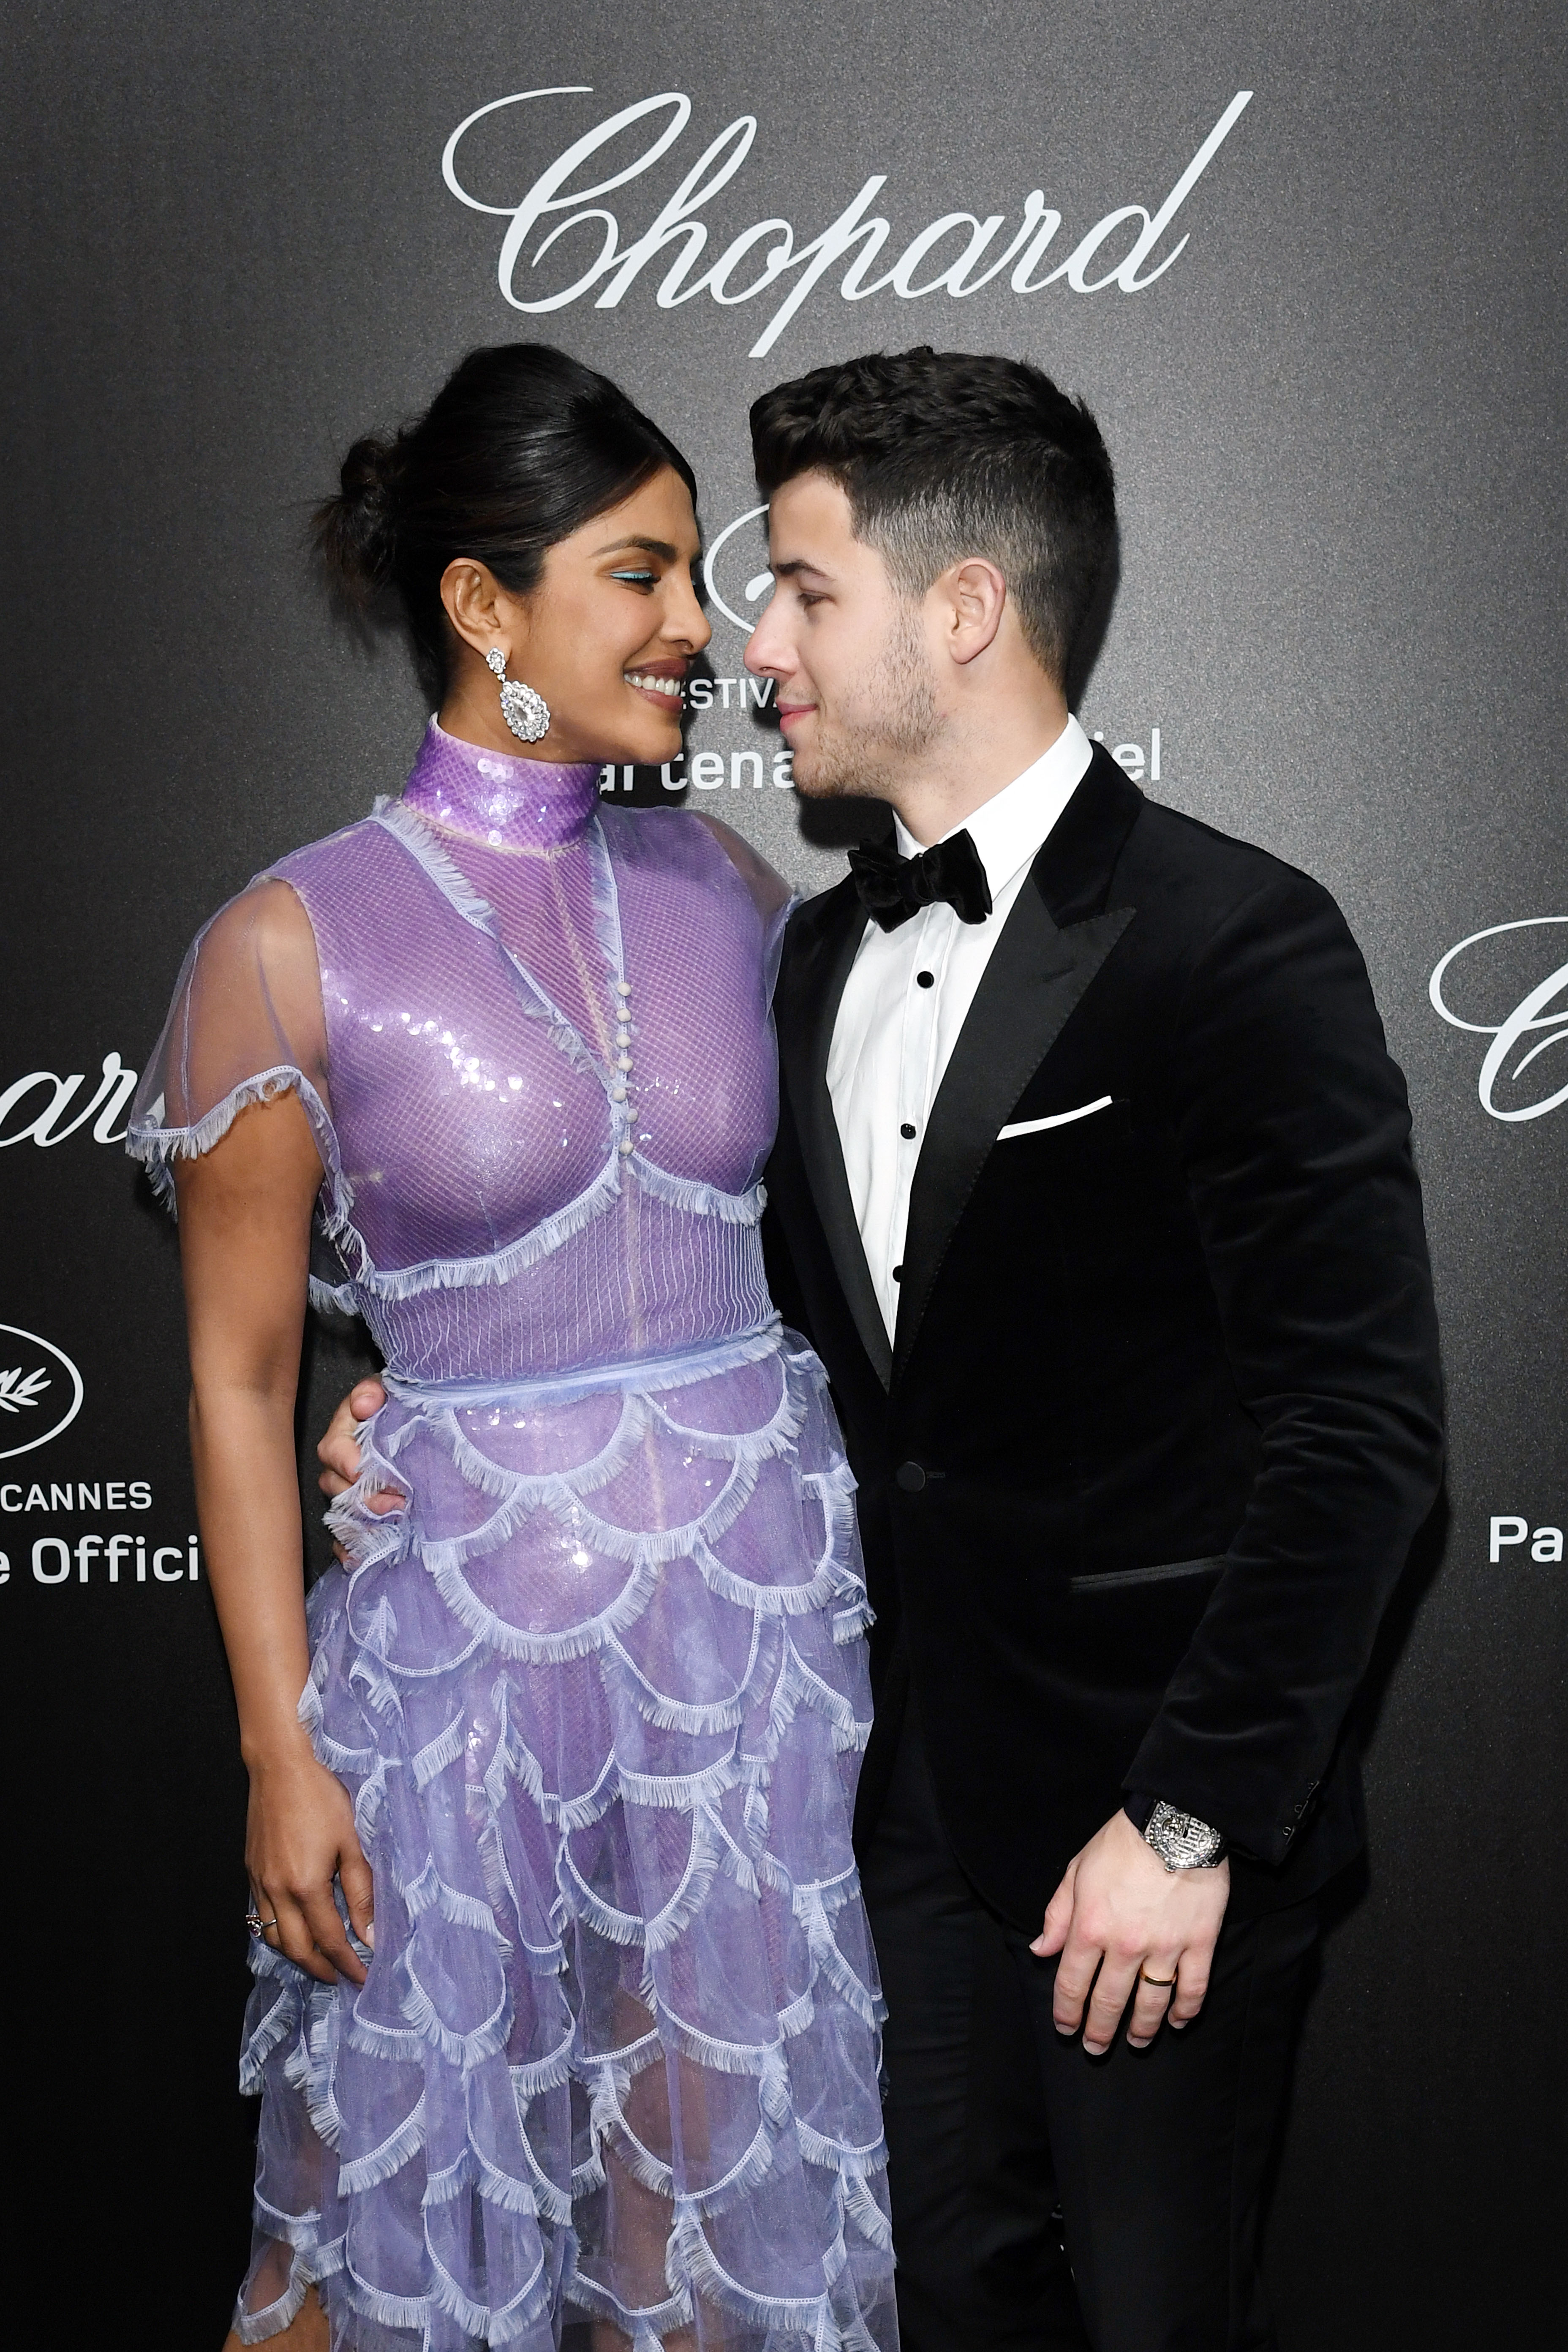 Priyanka Chopra (L) and Nick Jonas